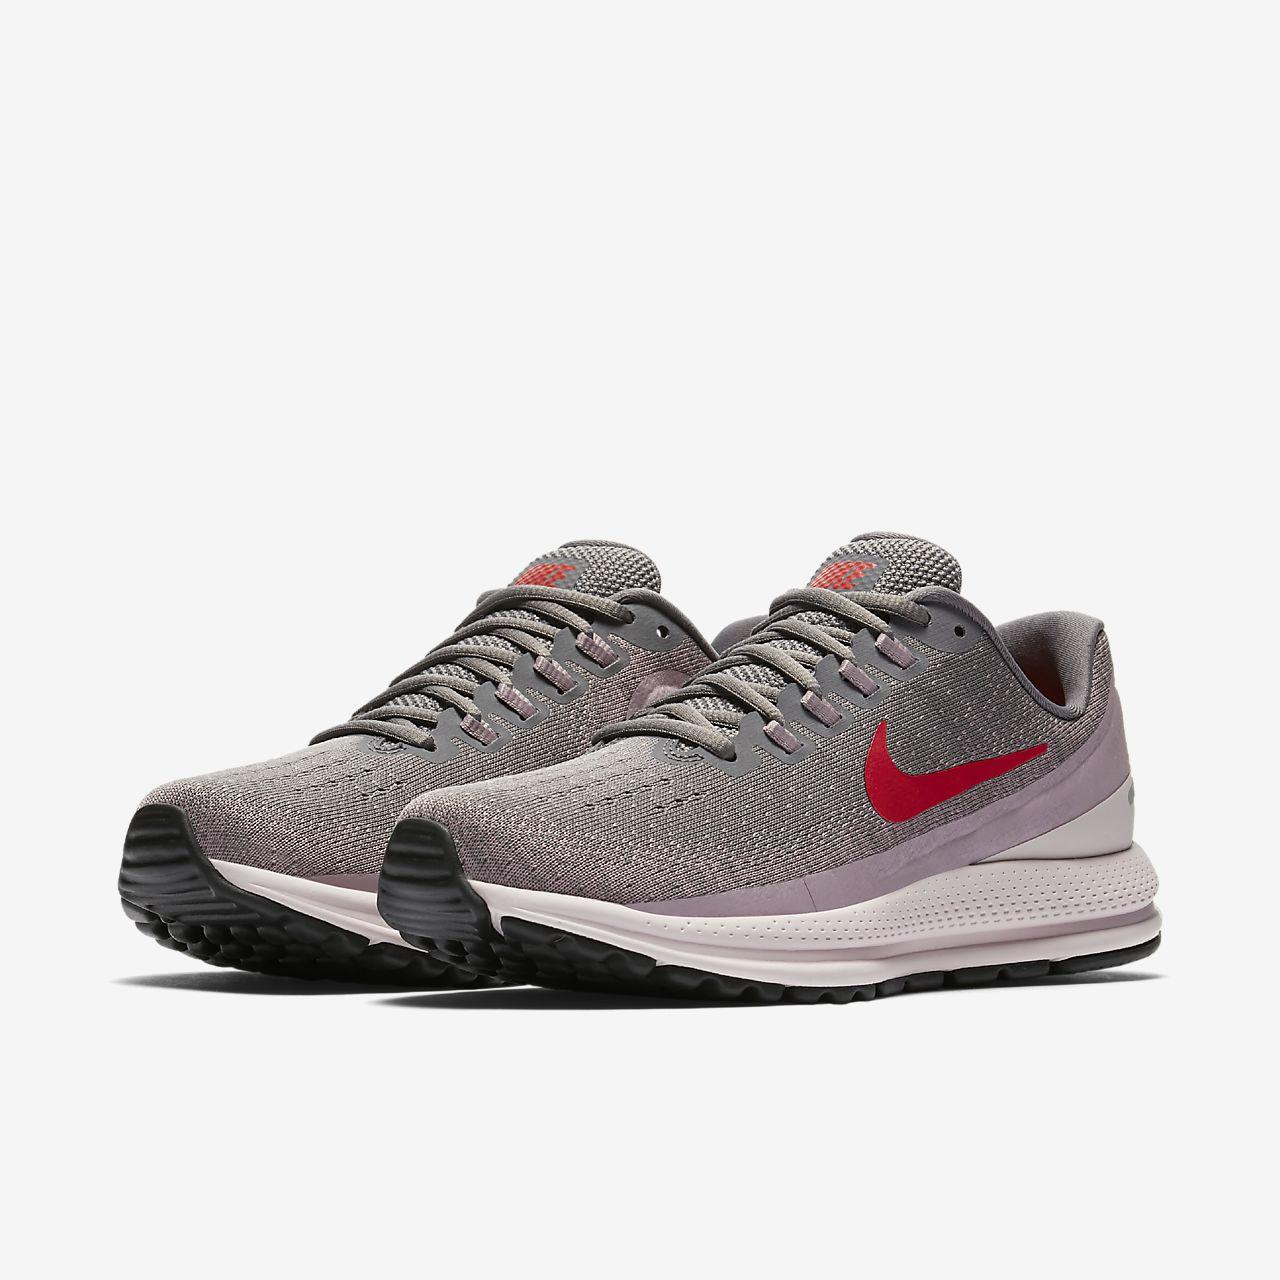 d220847139638 Nike Air Zoom Vomero 13 Women's Running Shoe. Nike.com CA